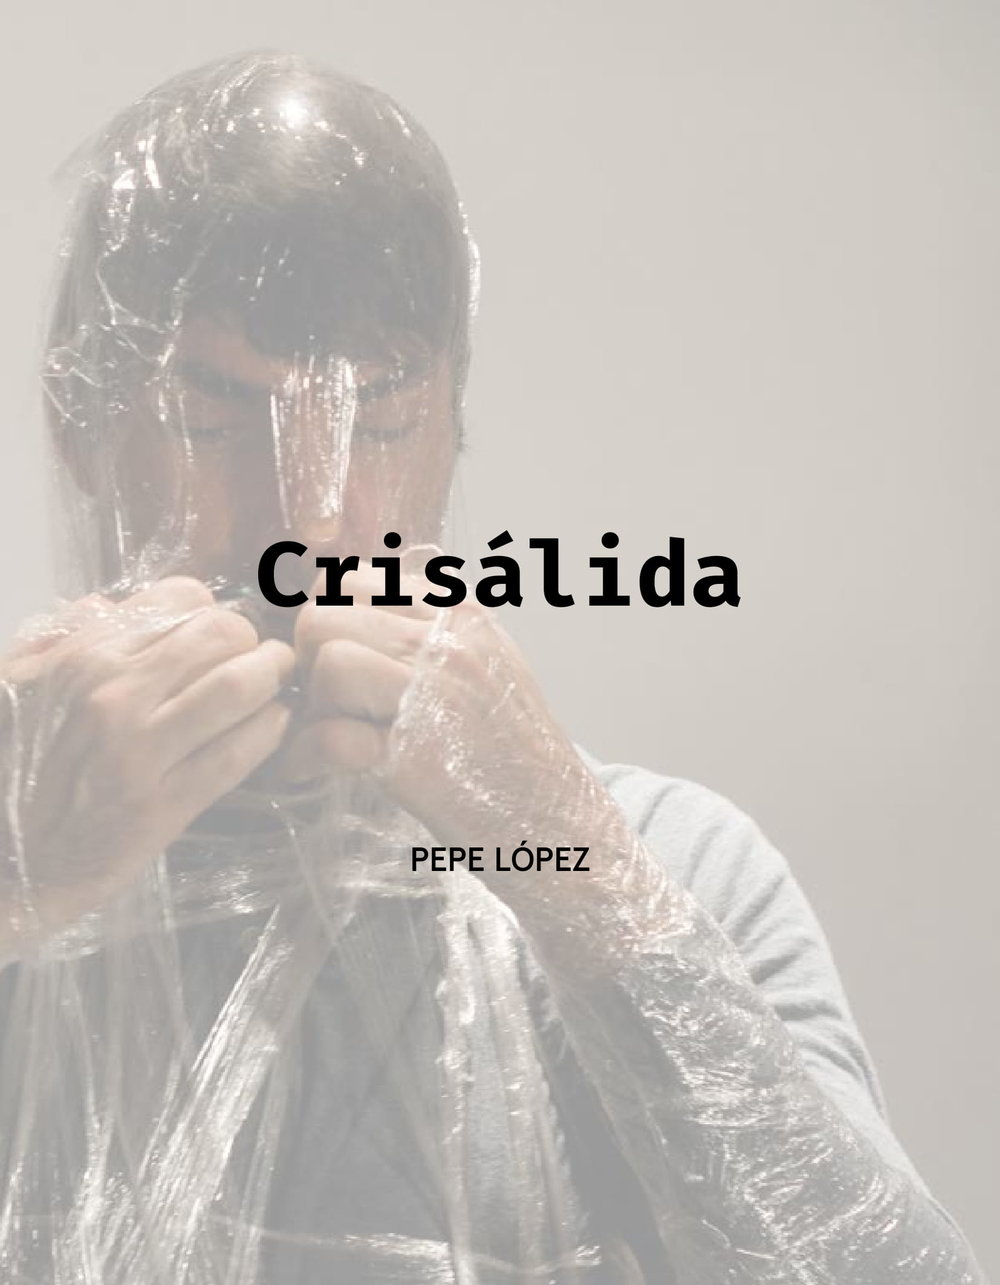 CRISALIDA_FOR WEB-01.jpg